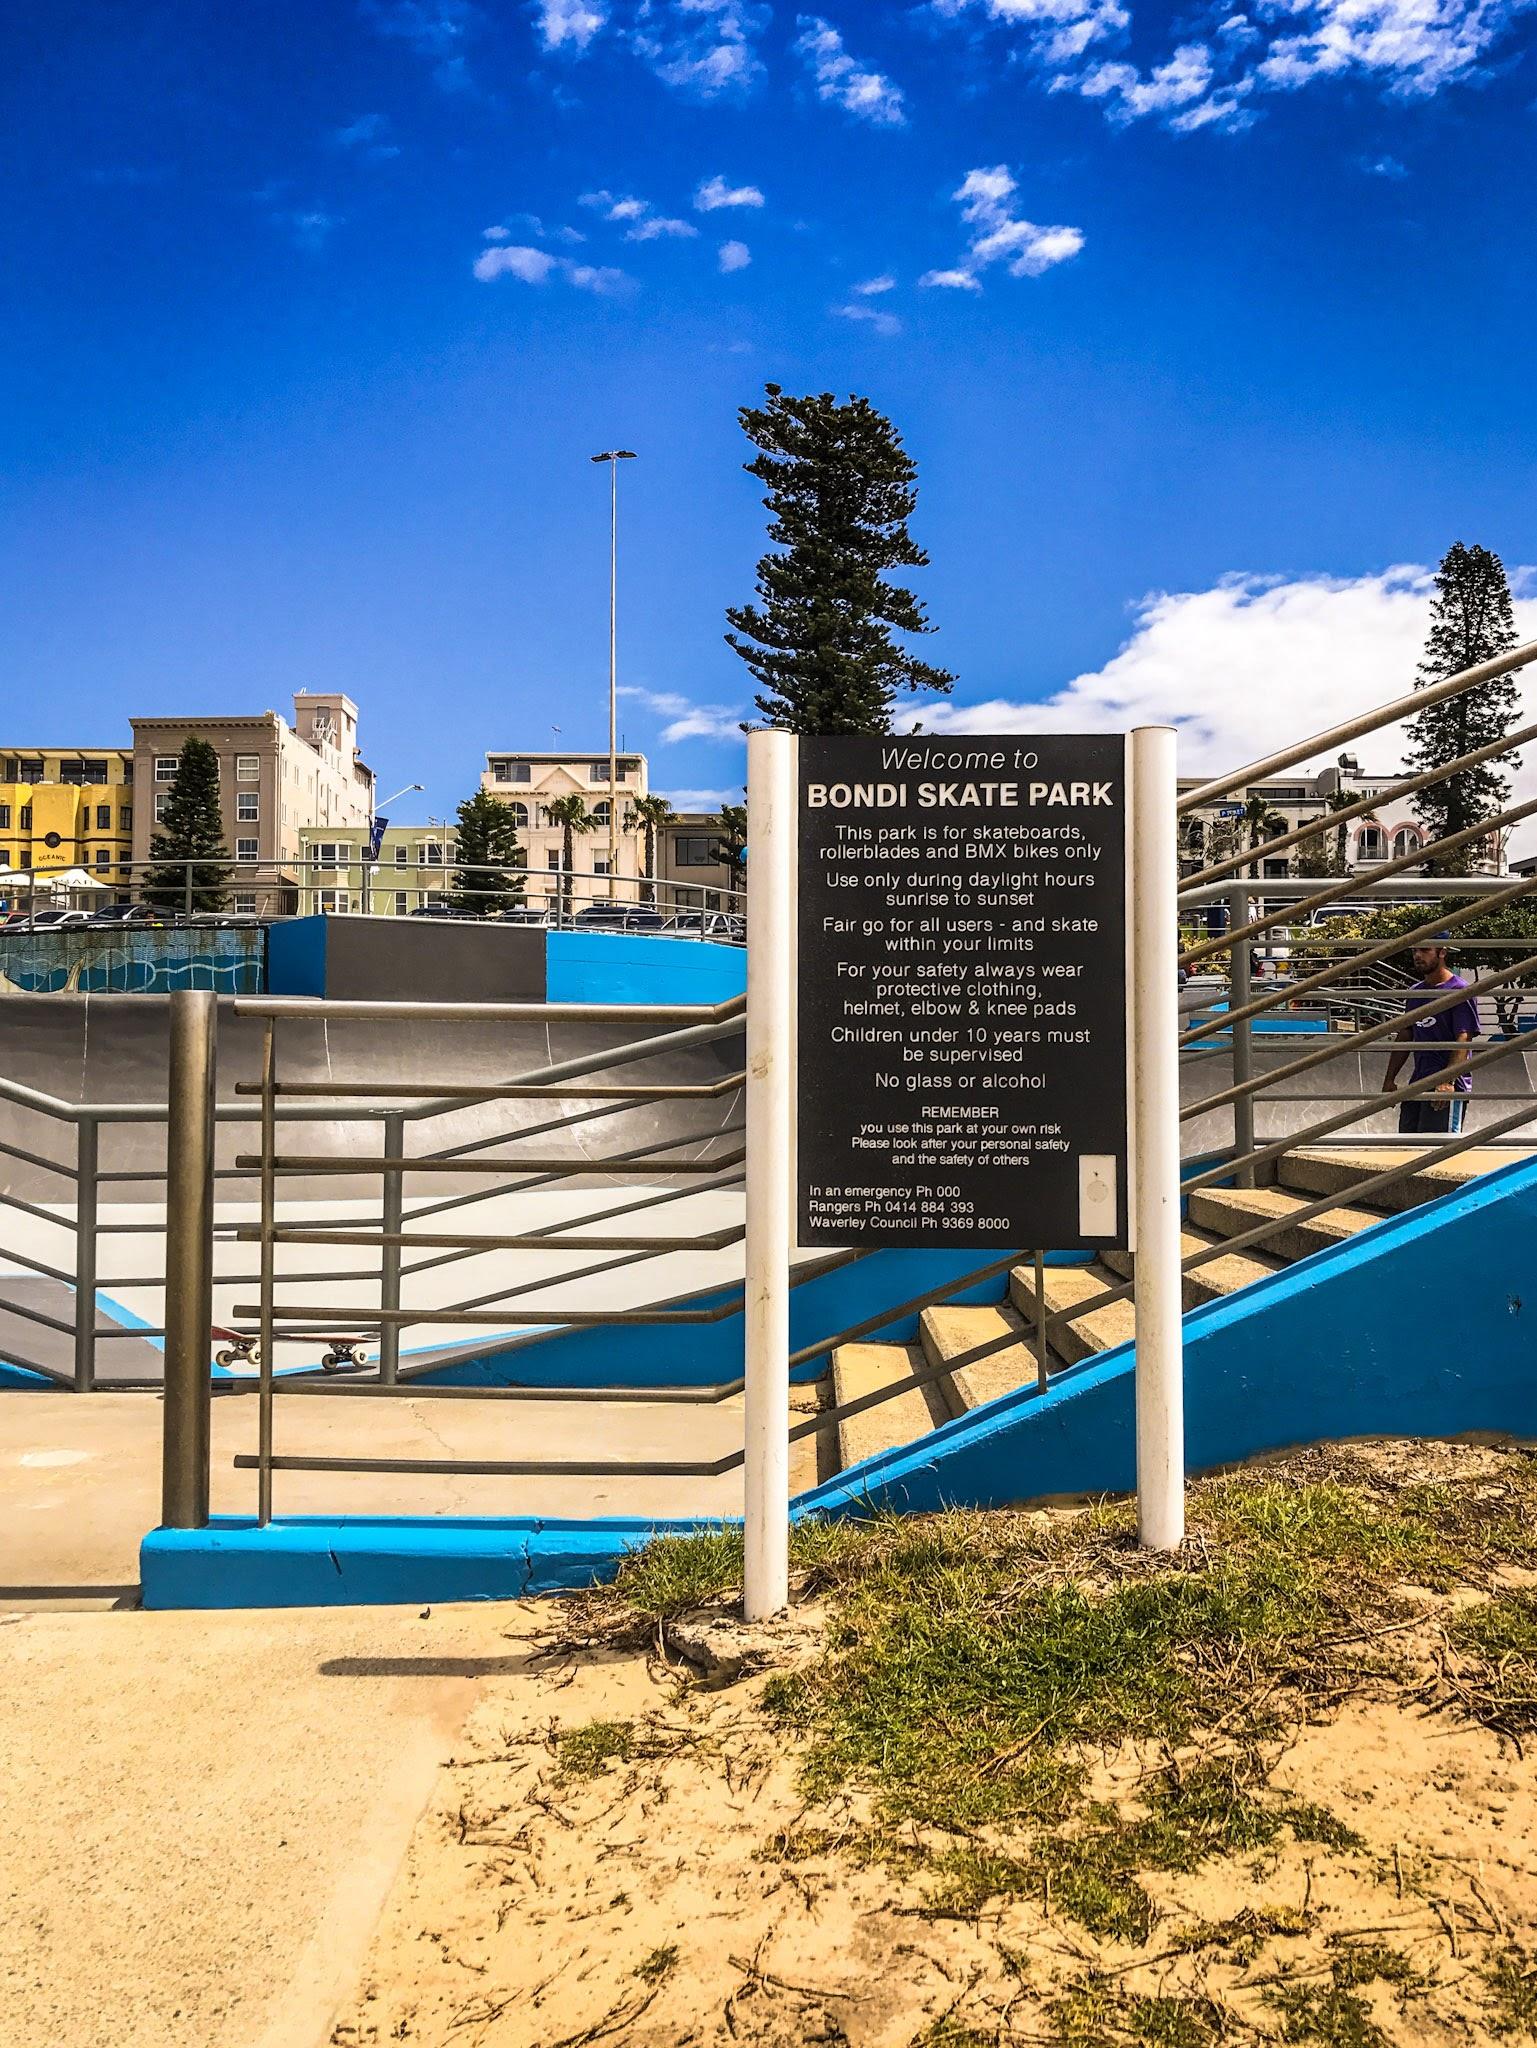 Skaters welcome!  Skate Park Bondi Beach, Sydney